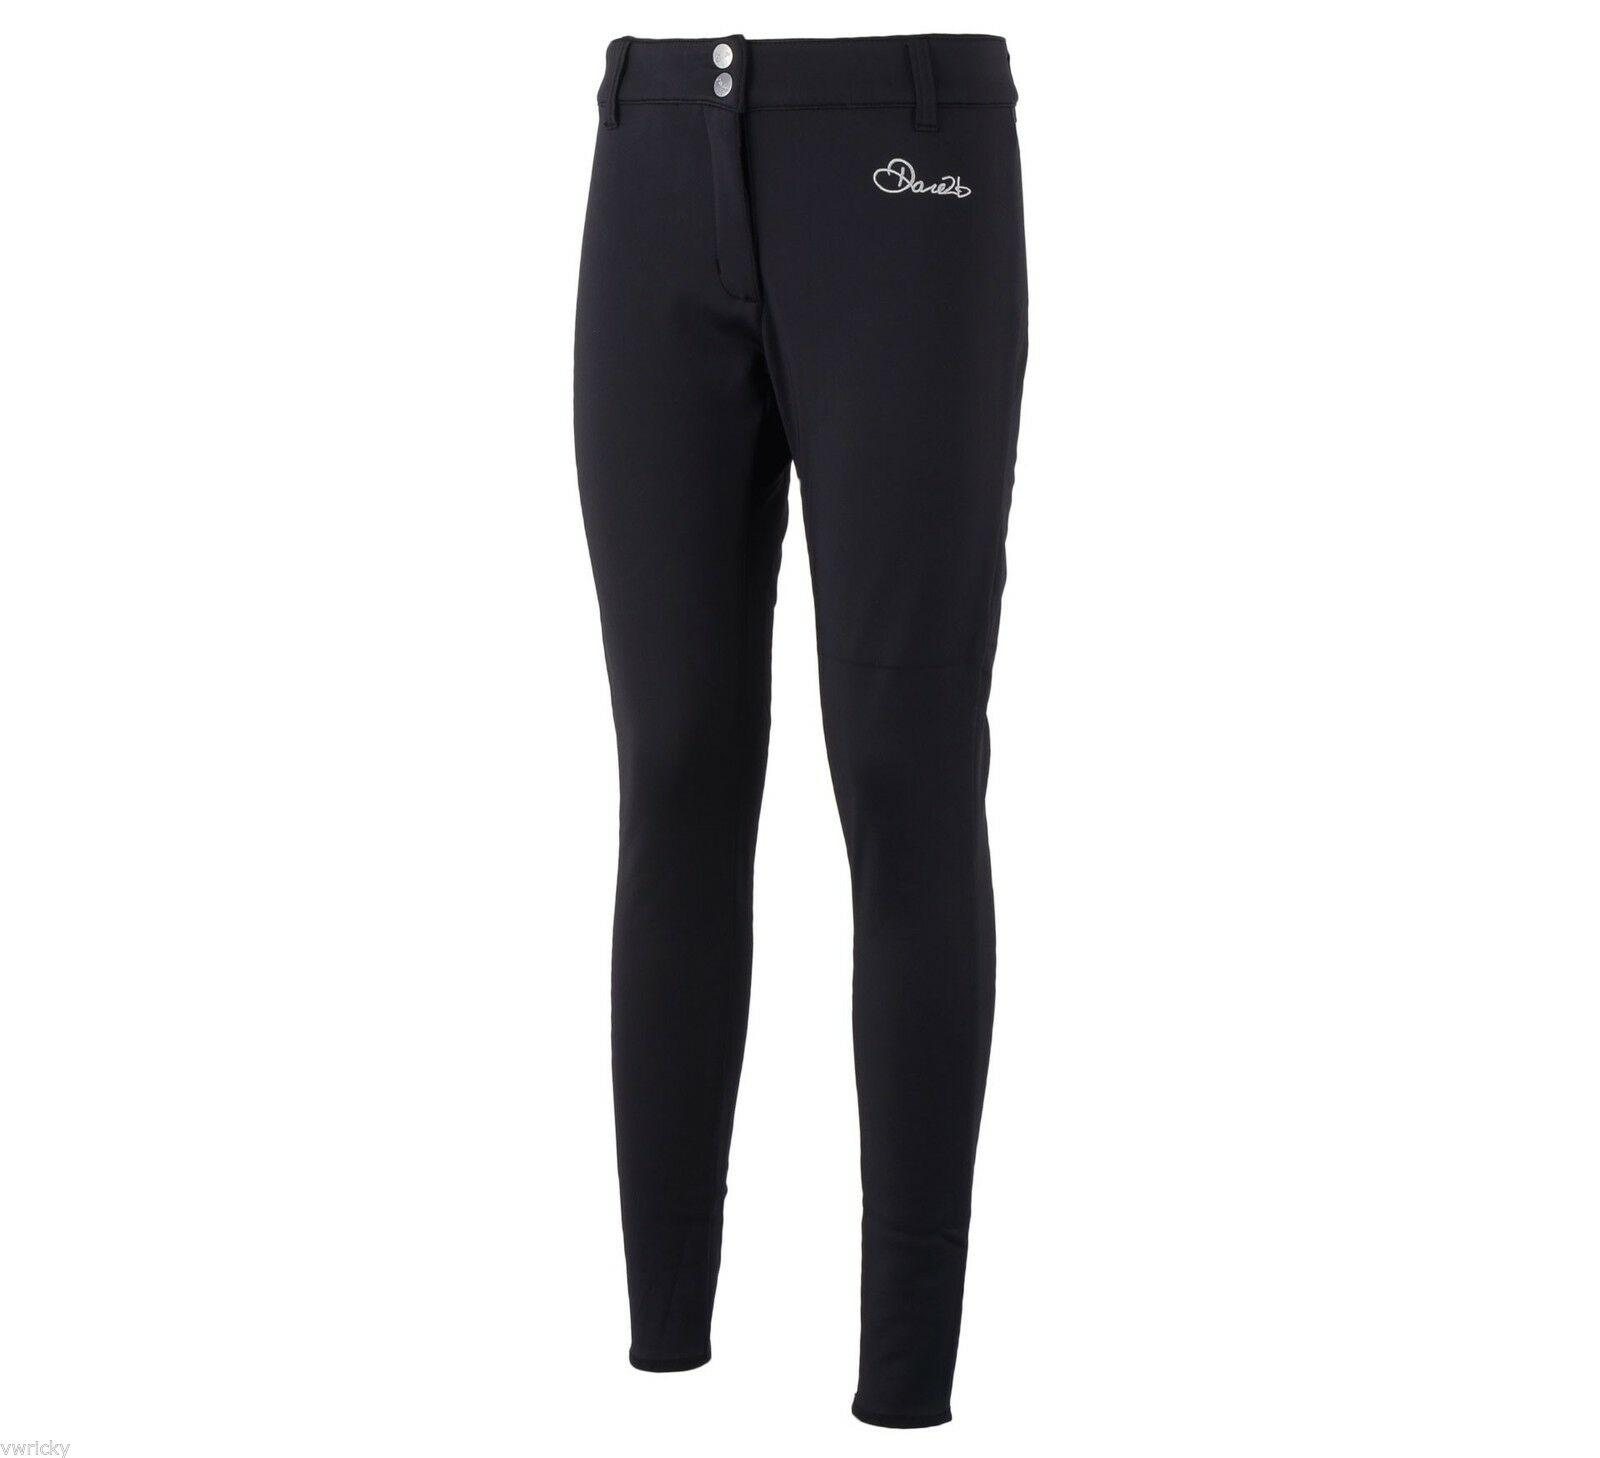 Dare2b-Shapely-Women-039-s-Windproof-Waterproof-Breathable-Ski-Trouser thumbnail 3